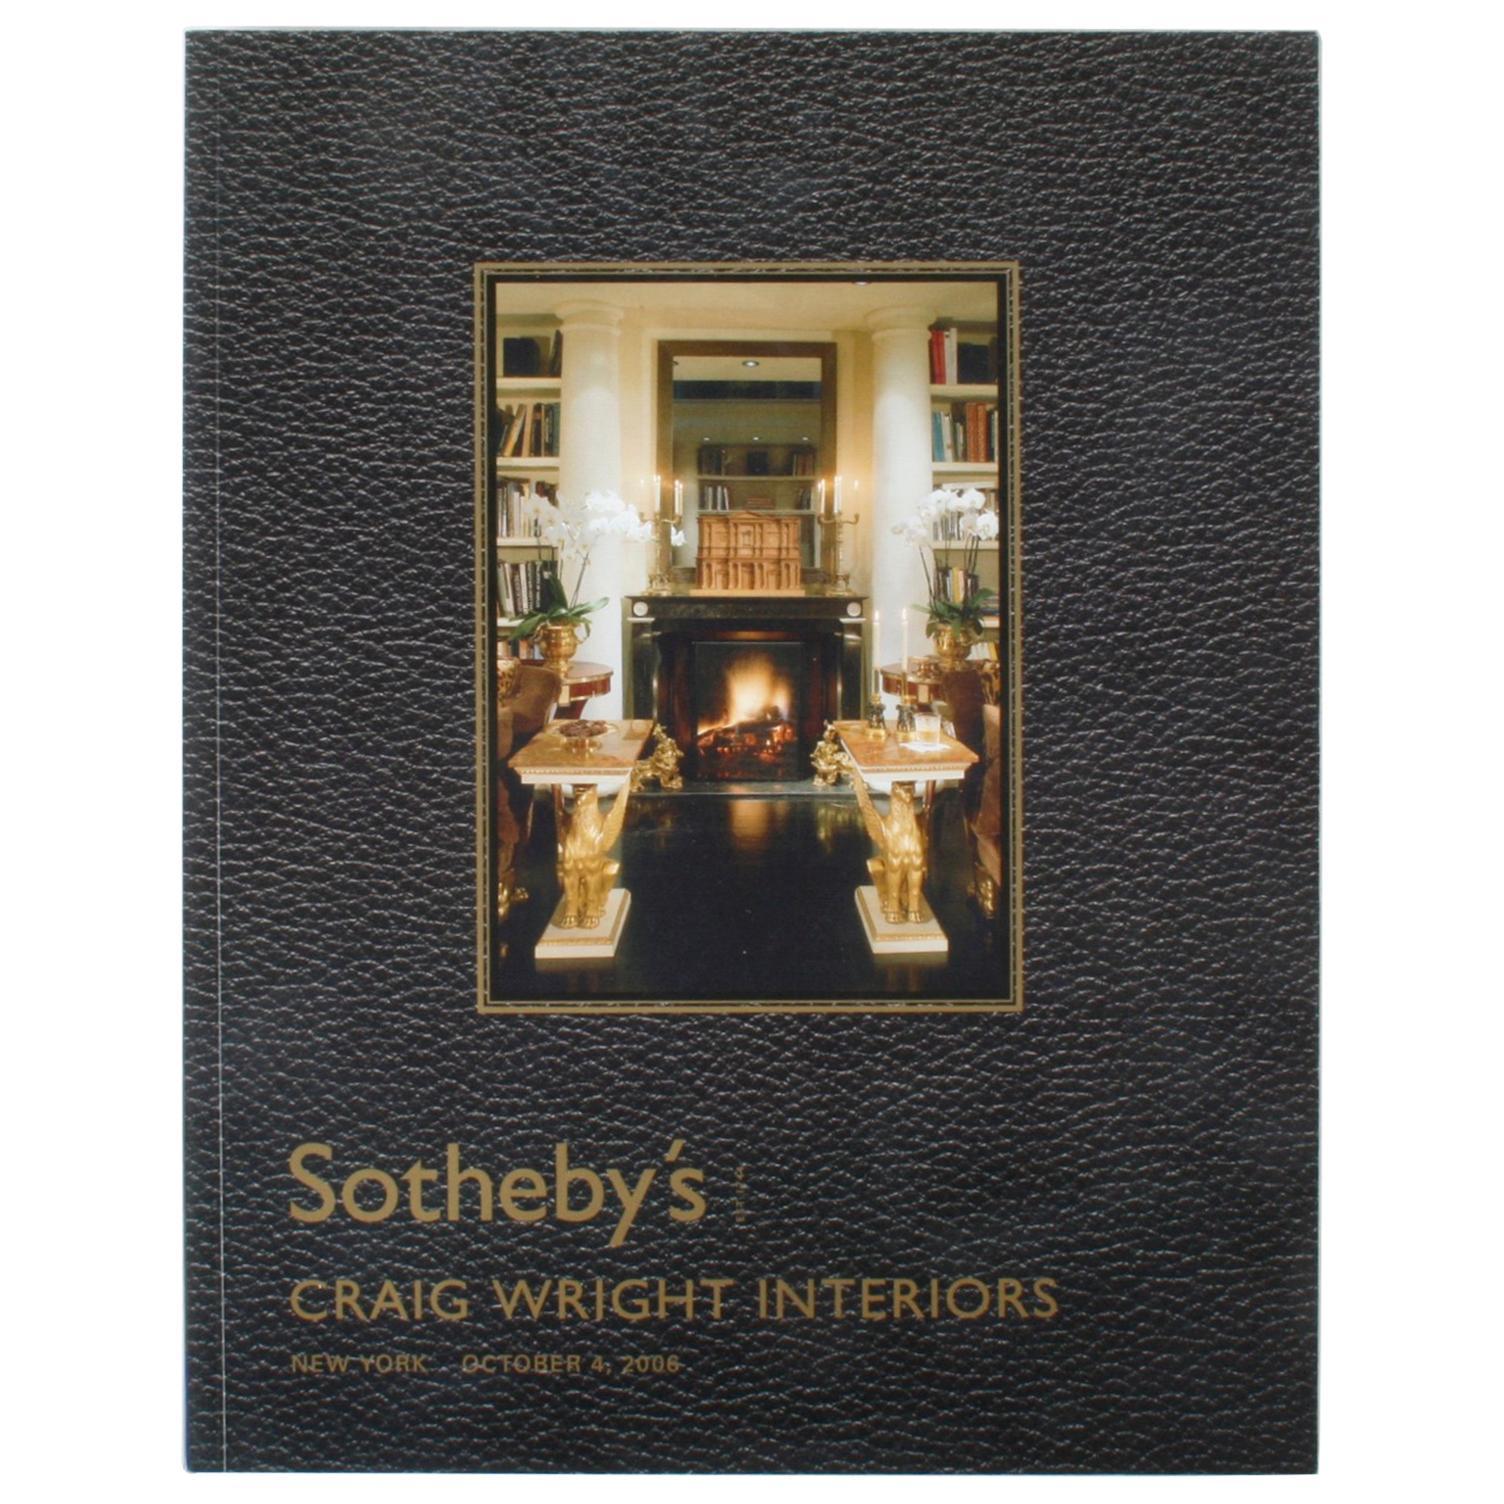 Sotheby's: Craig Wright Interiors, New York: October 4, 2006